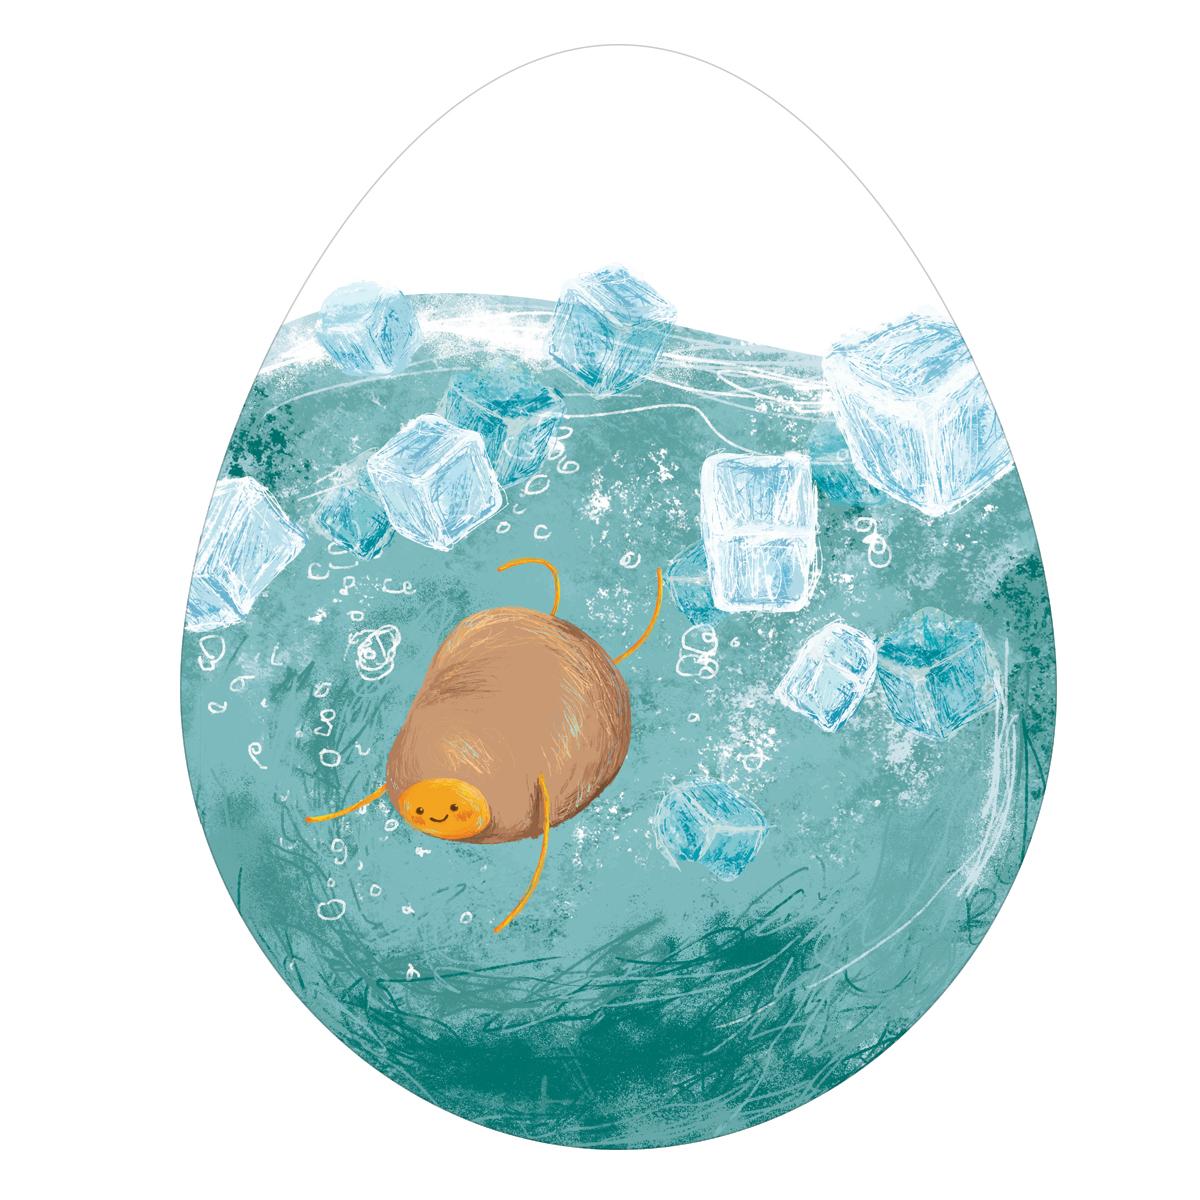 Eggfographic_forweb6.jpg